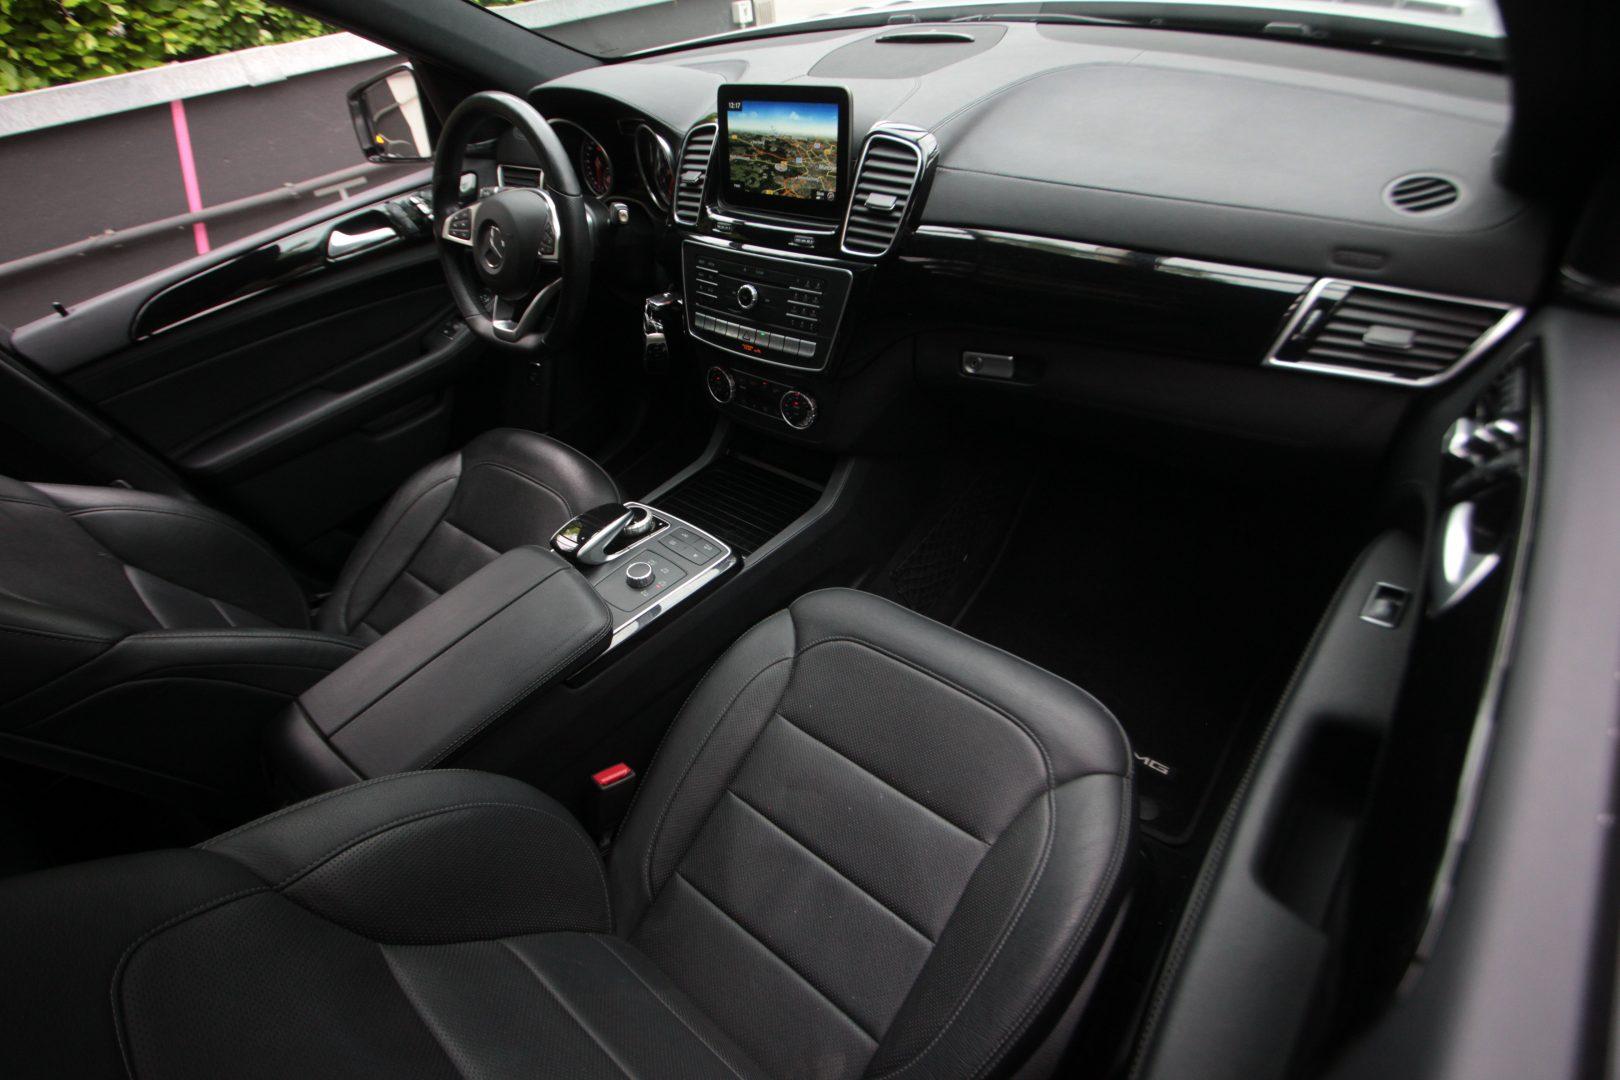 AIL Mercedes-Benz GLE 450 AMG 4Matic 7